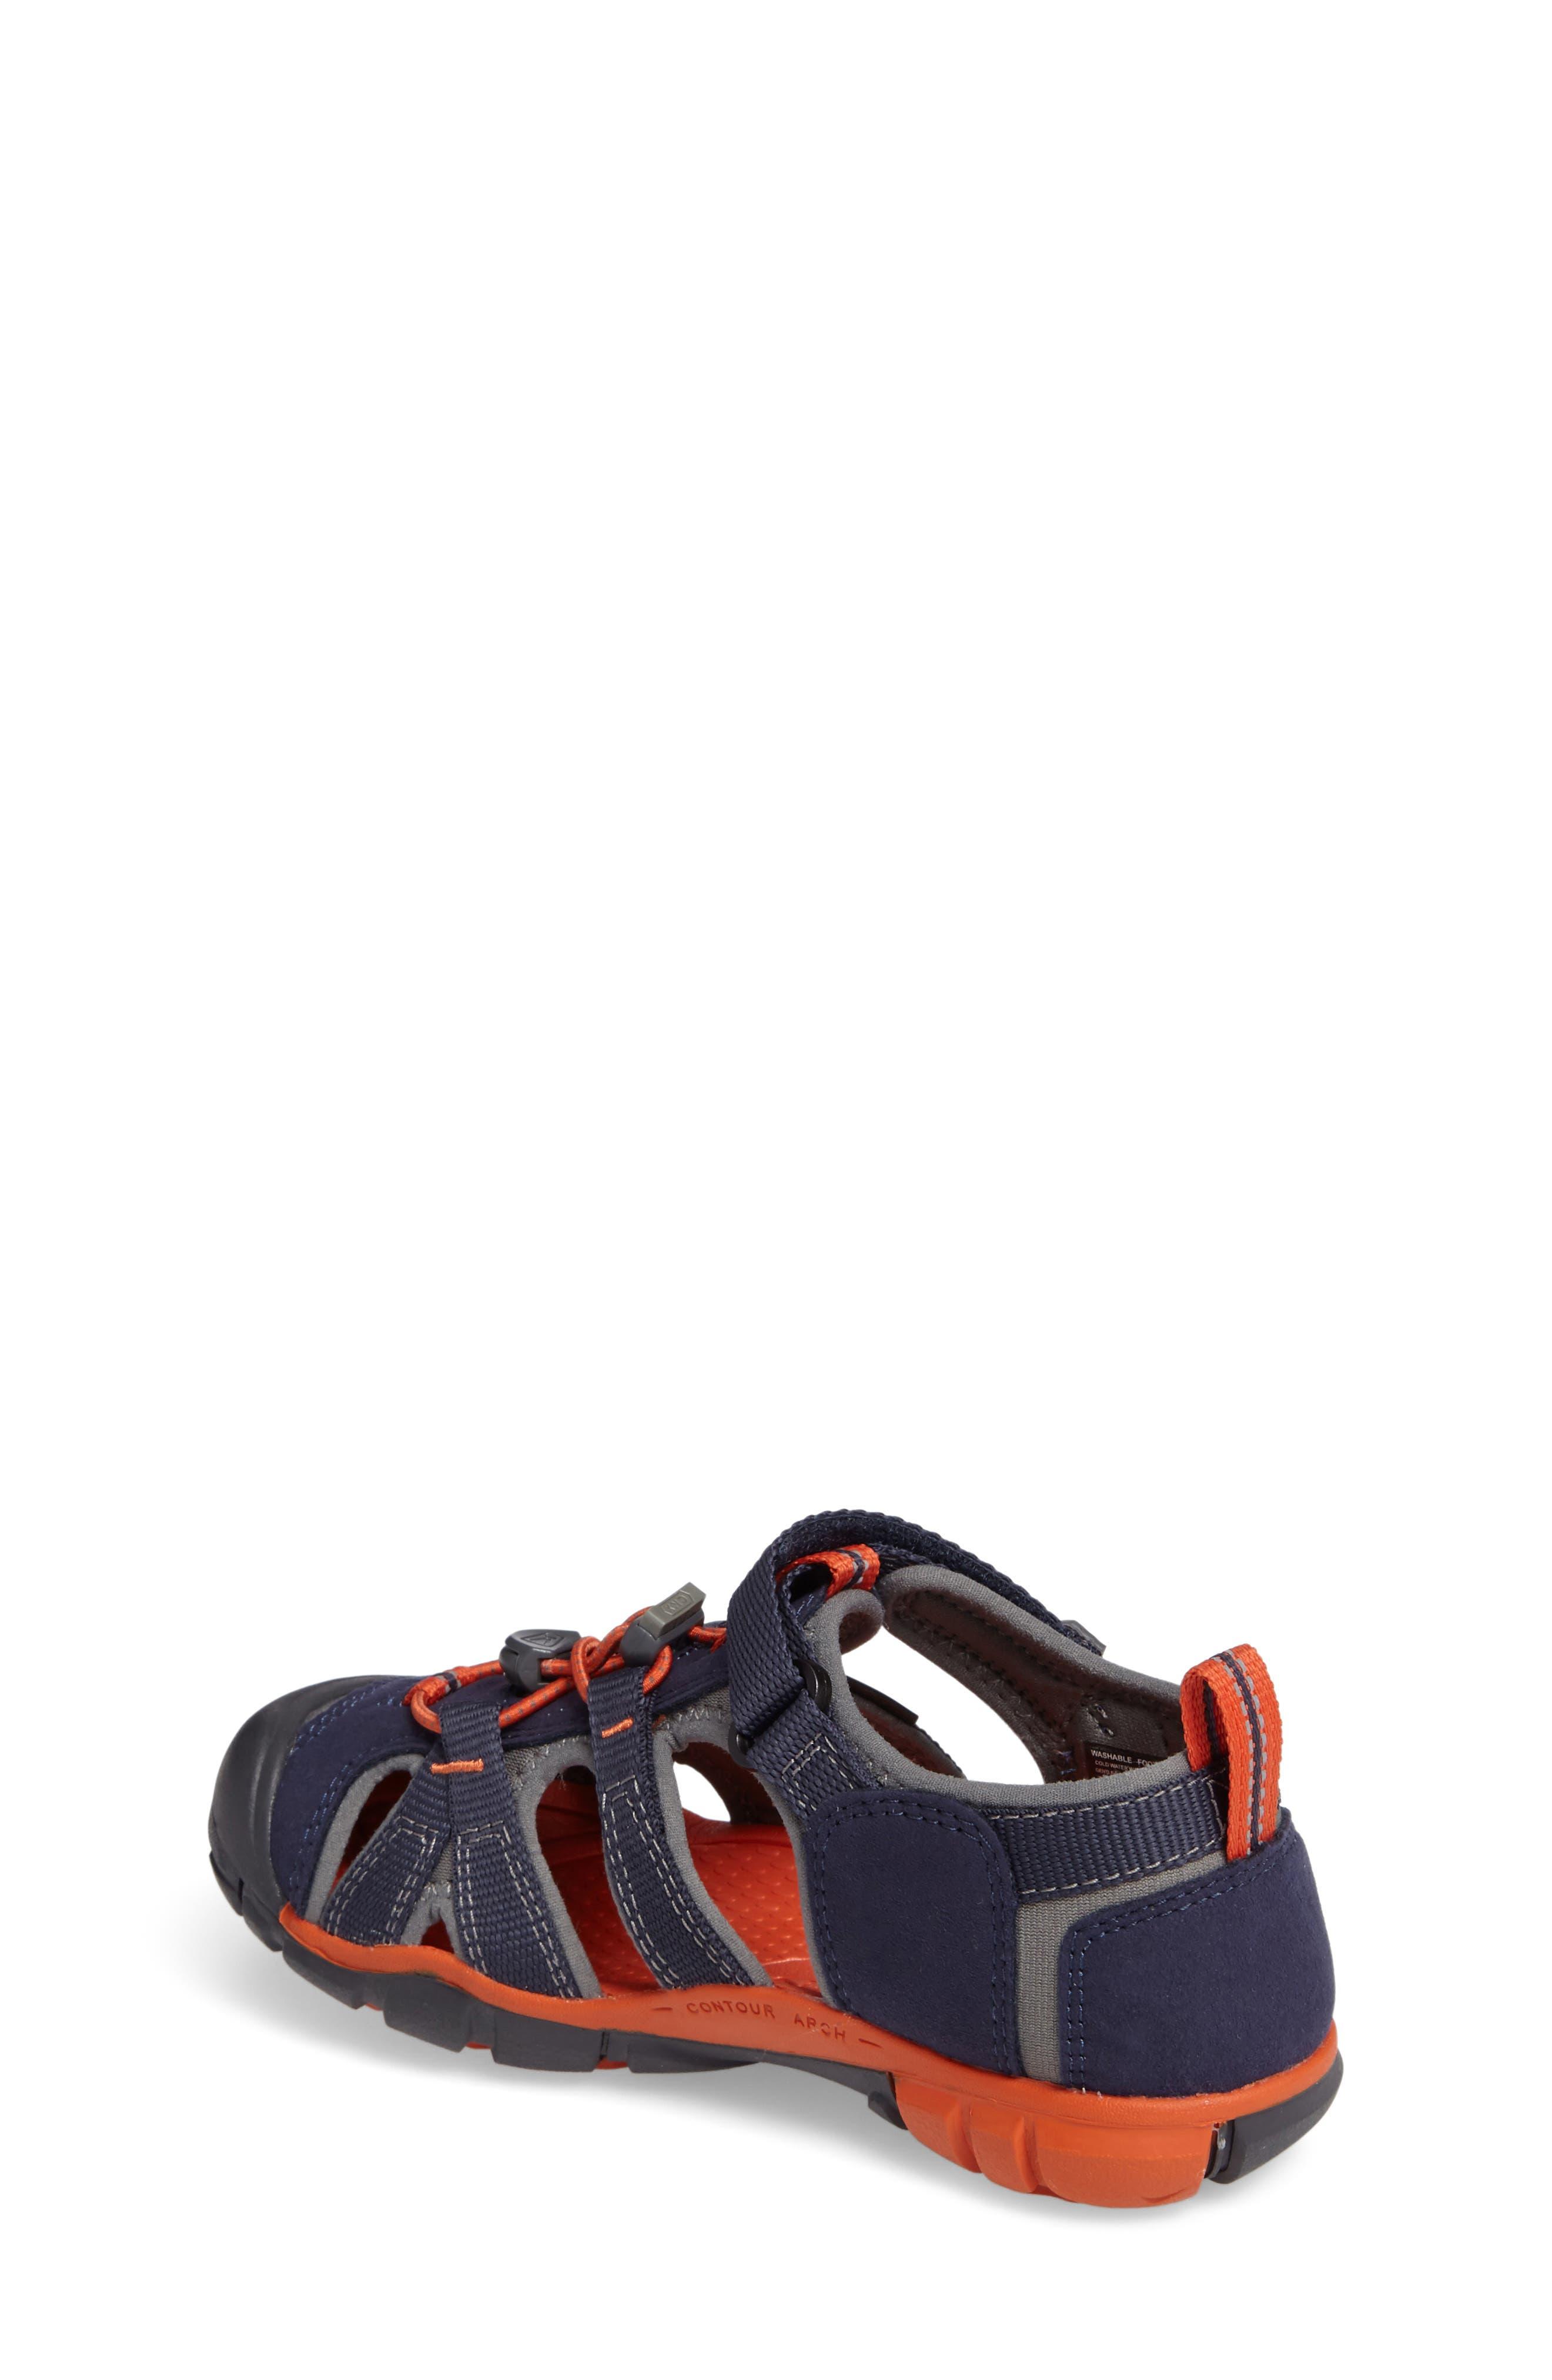 ,                             'Seacamp II' Water Friendly Sandal,                             Alternate thumbnail 176, color,                             407